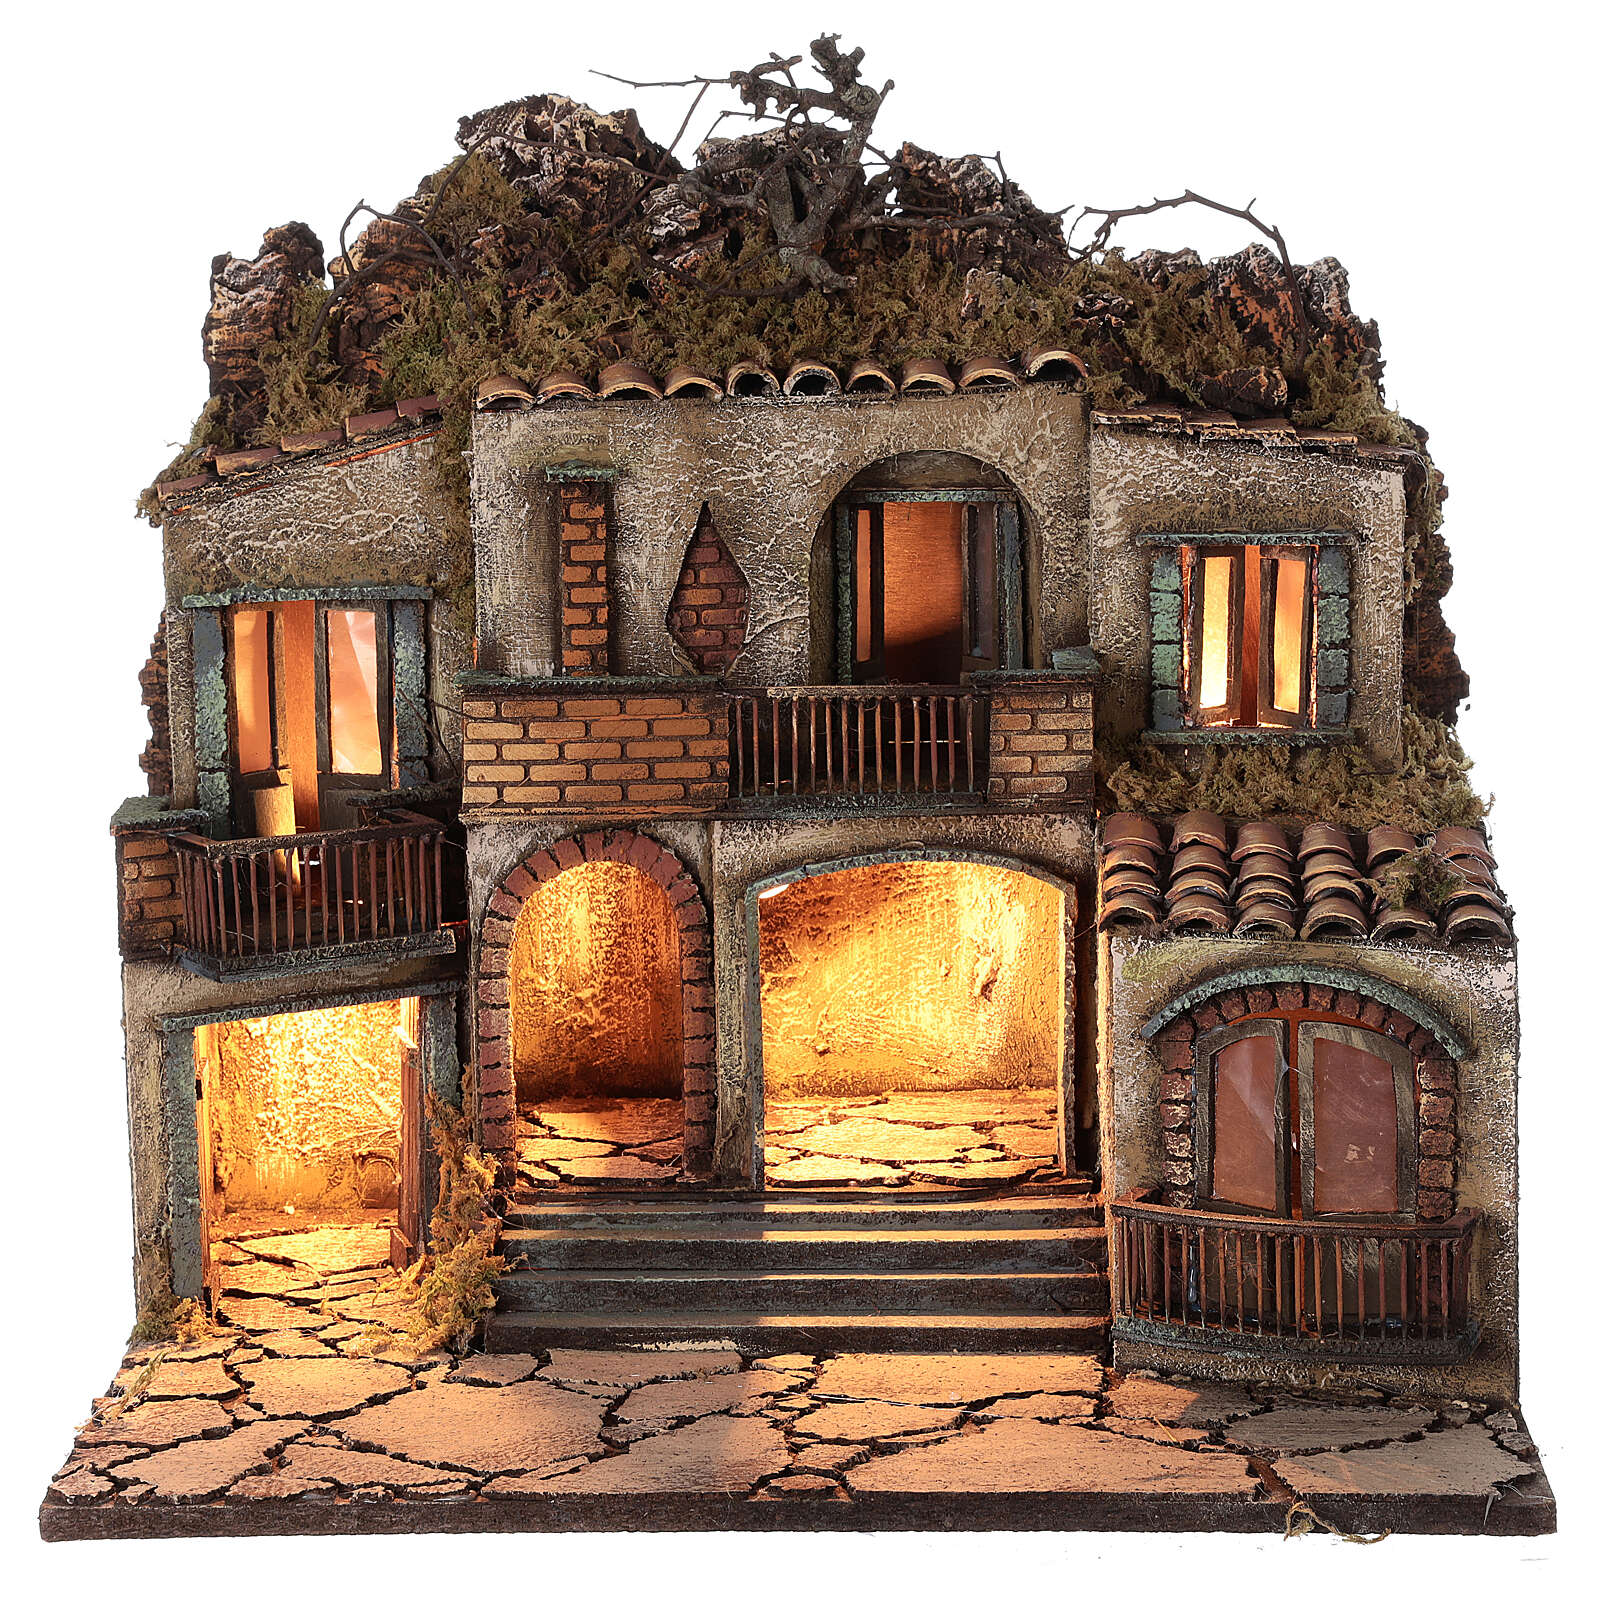 Iluminated village three houses 50x50x40 cm Neapolitan Nativity Scene for figurines of 10-12 cm average height 4